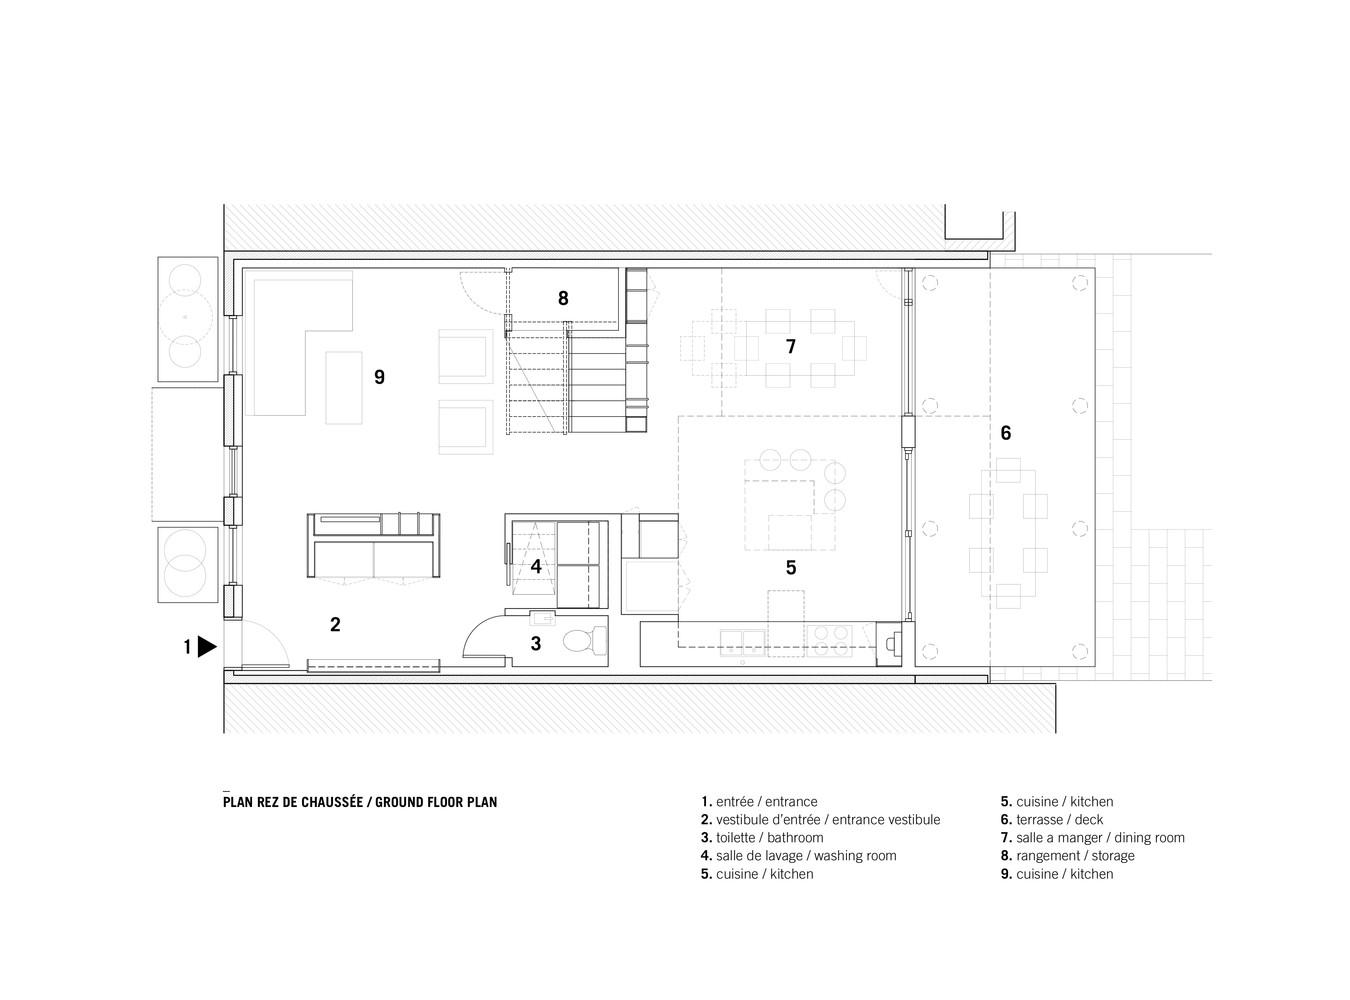 Chambord Residence,Ground Floor Plan